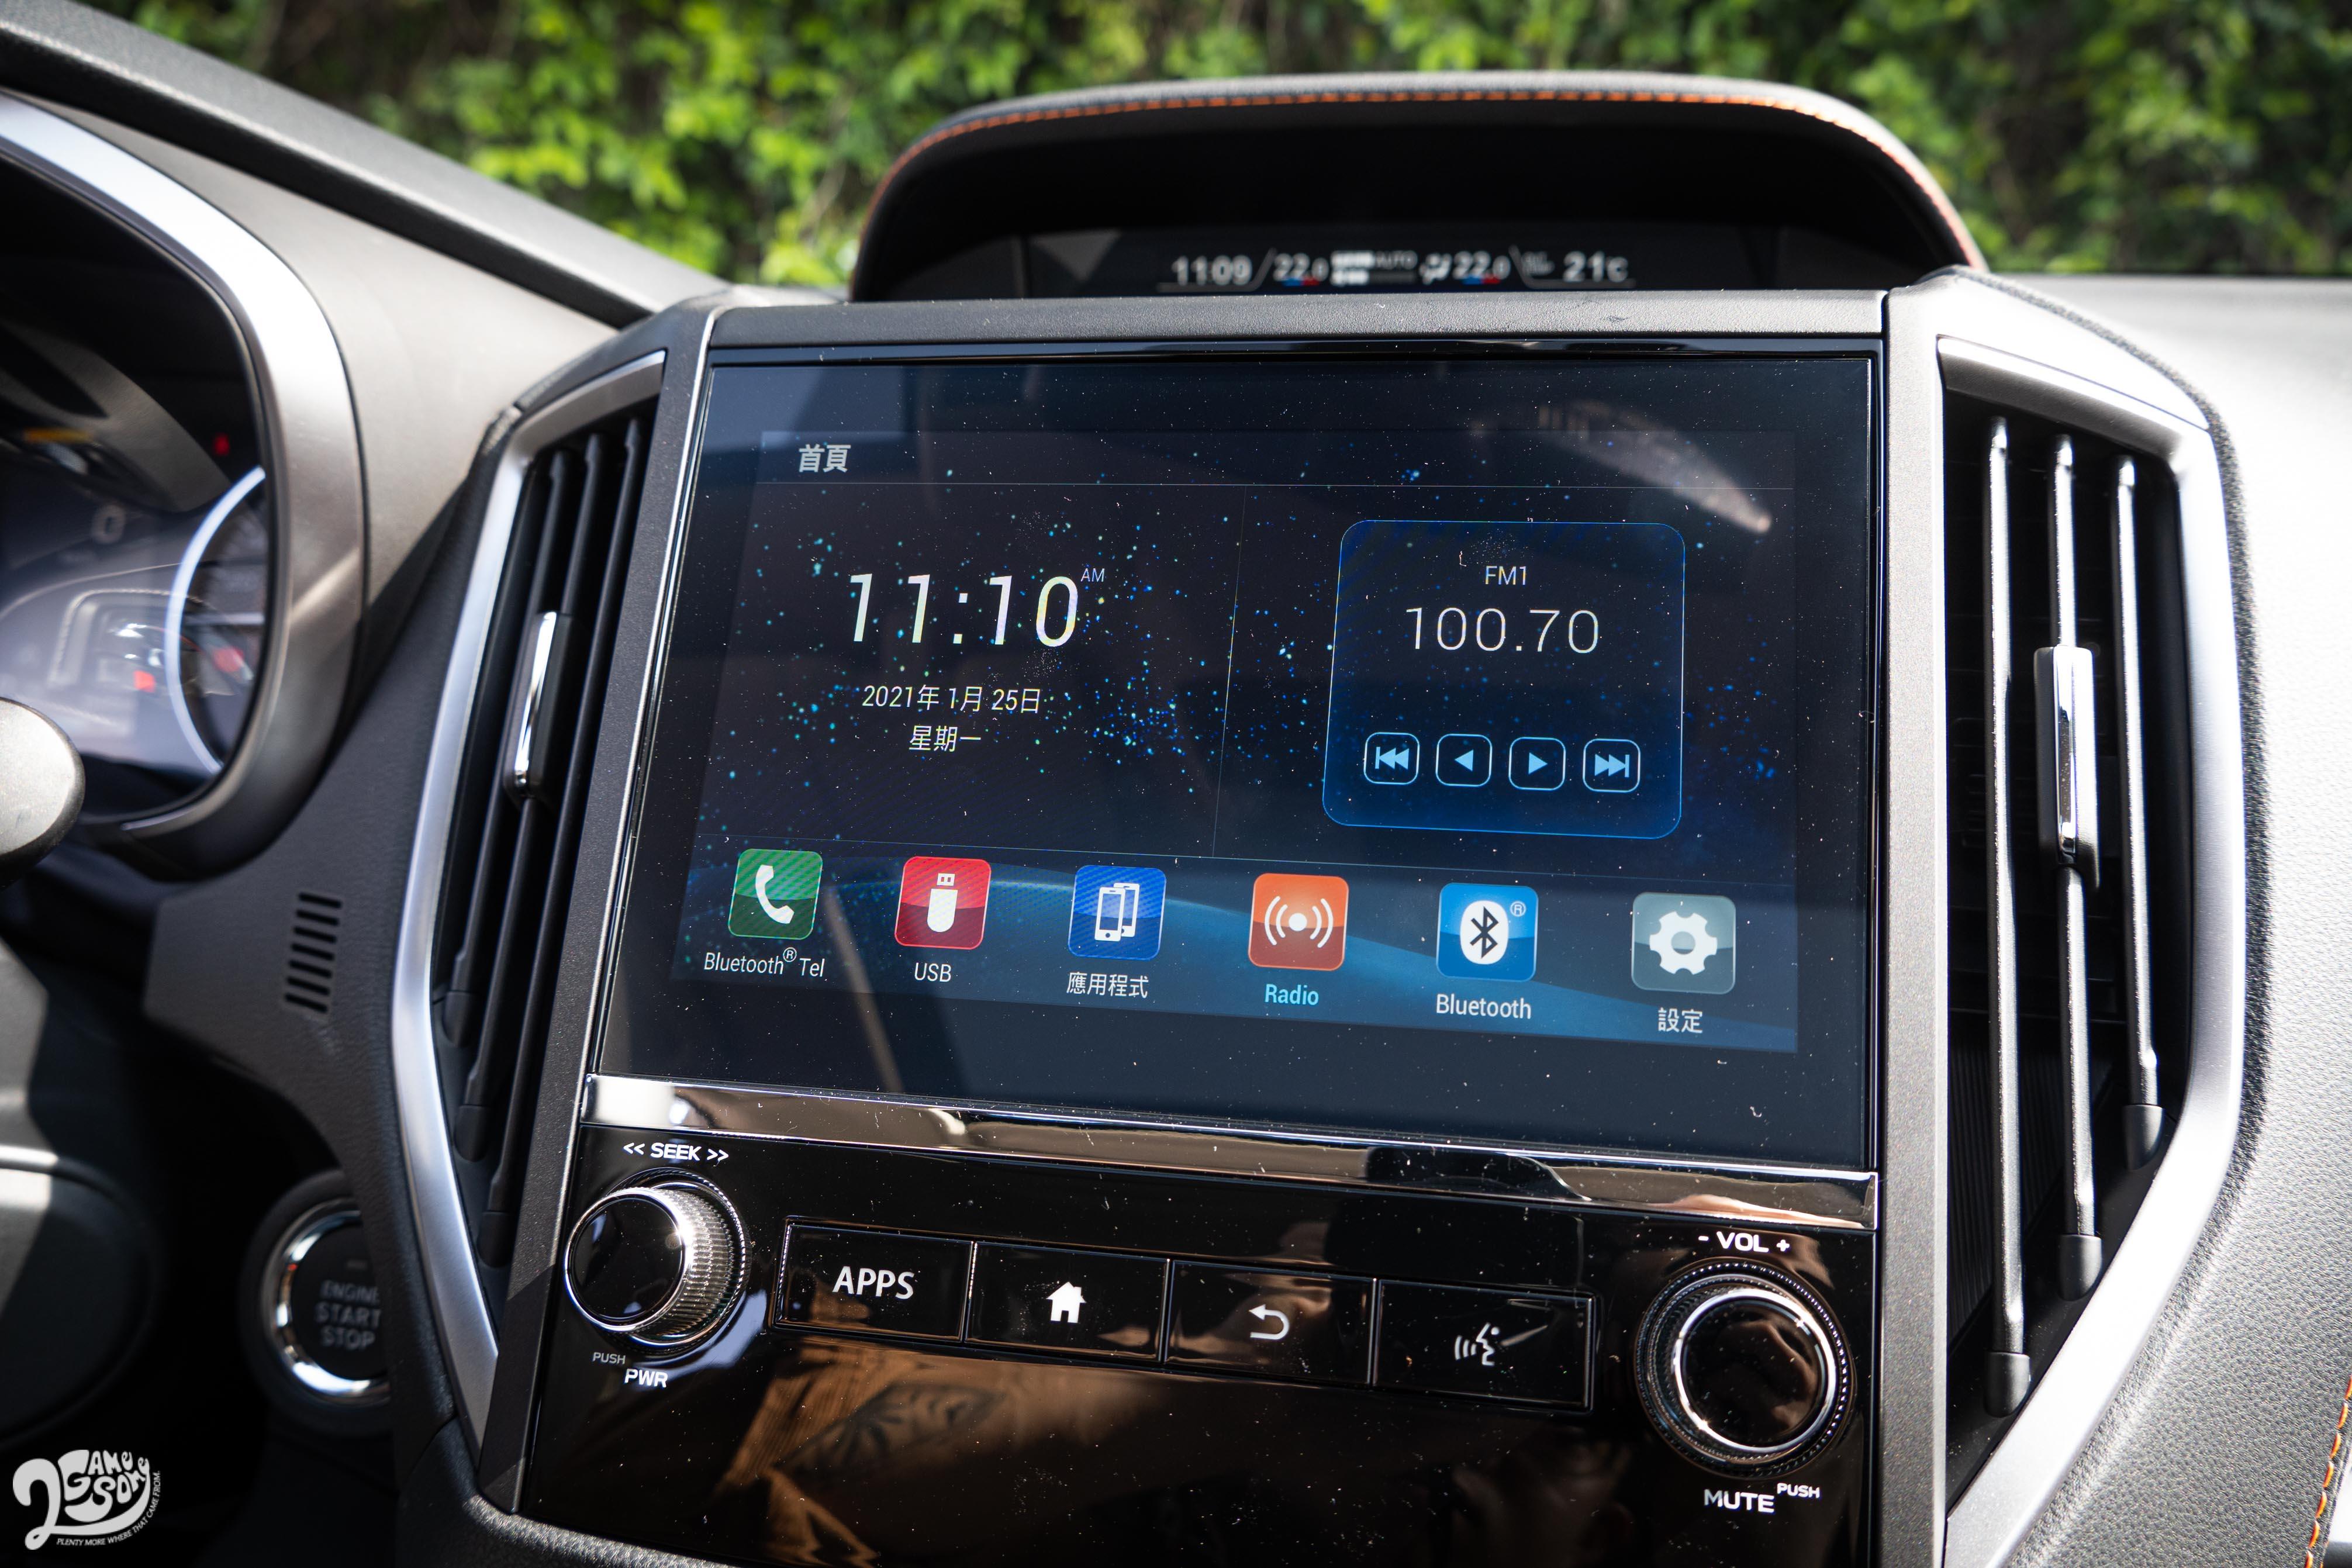 8 吋觸控螢幕支援 Apple CaPlay 與 Android Auto。